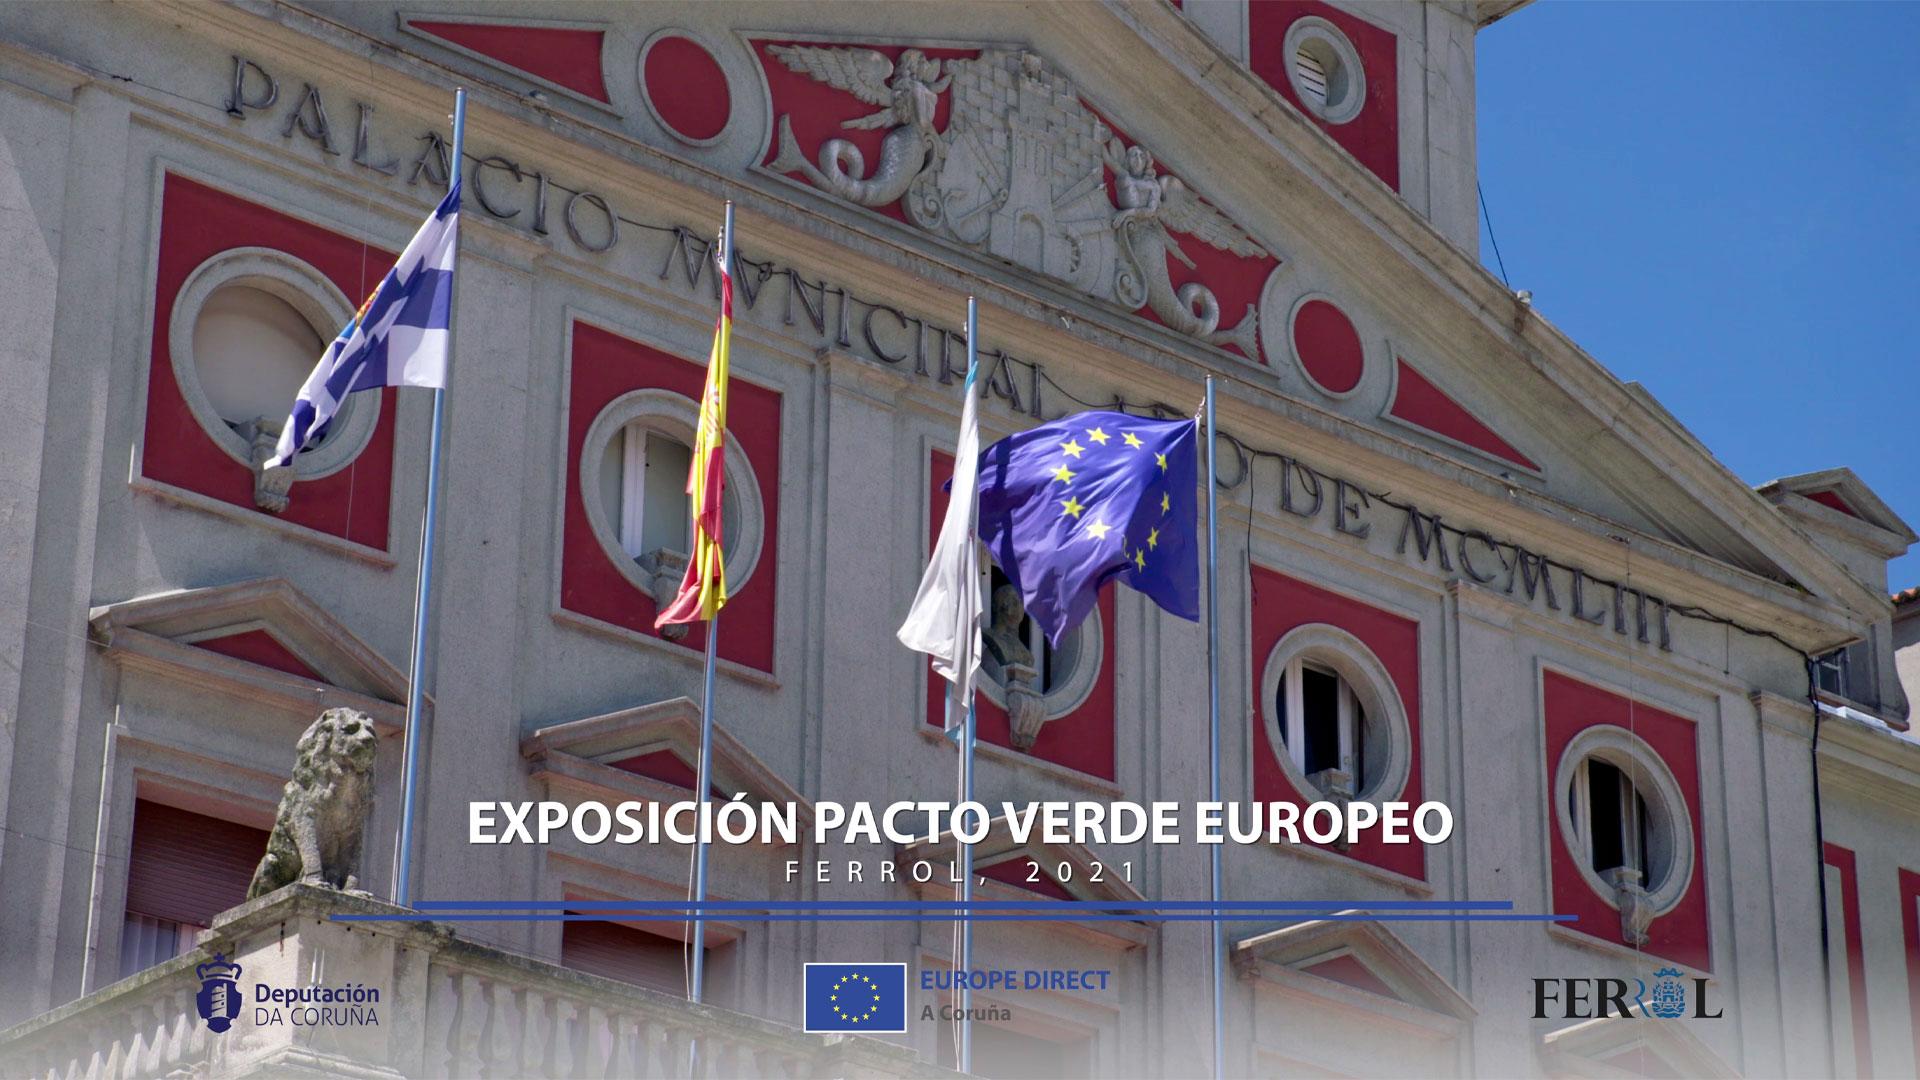 Europe Direct Ferrol